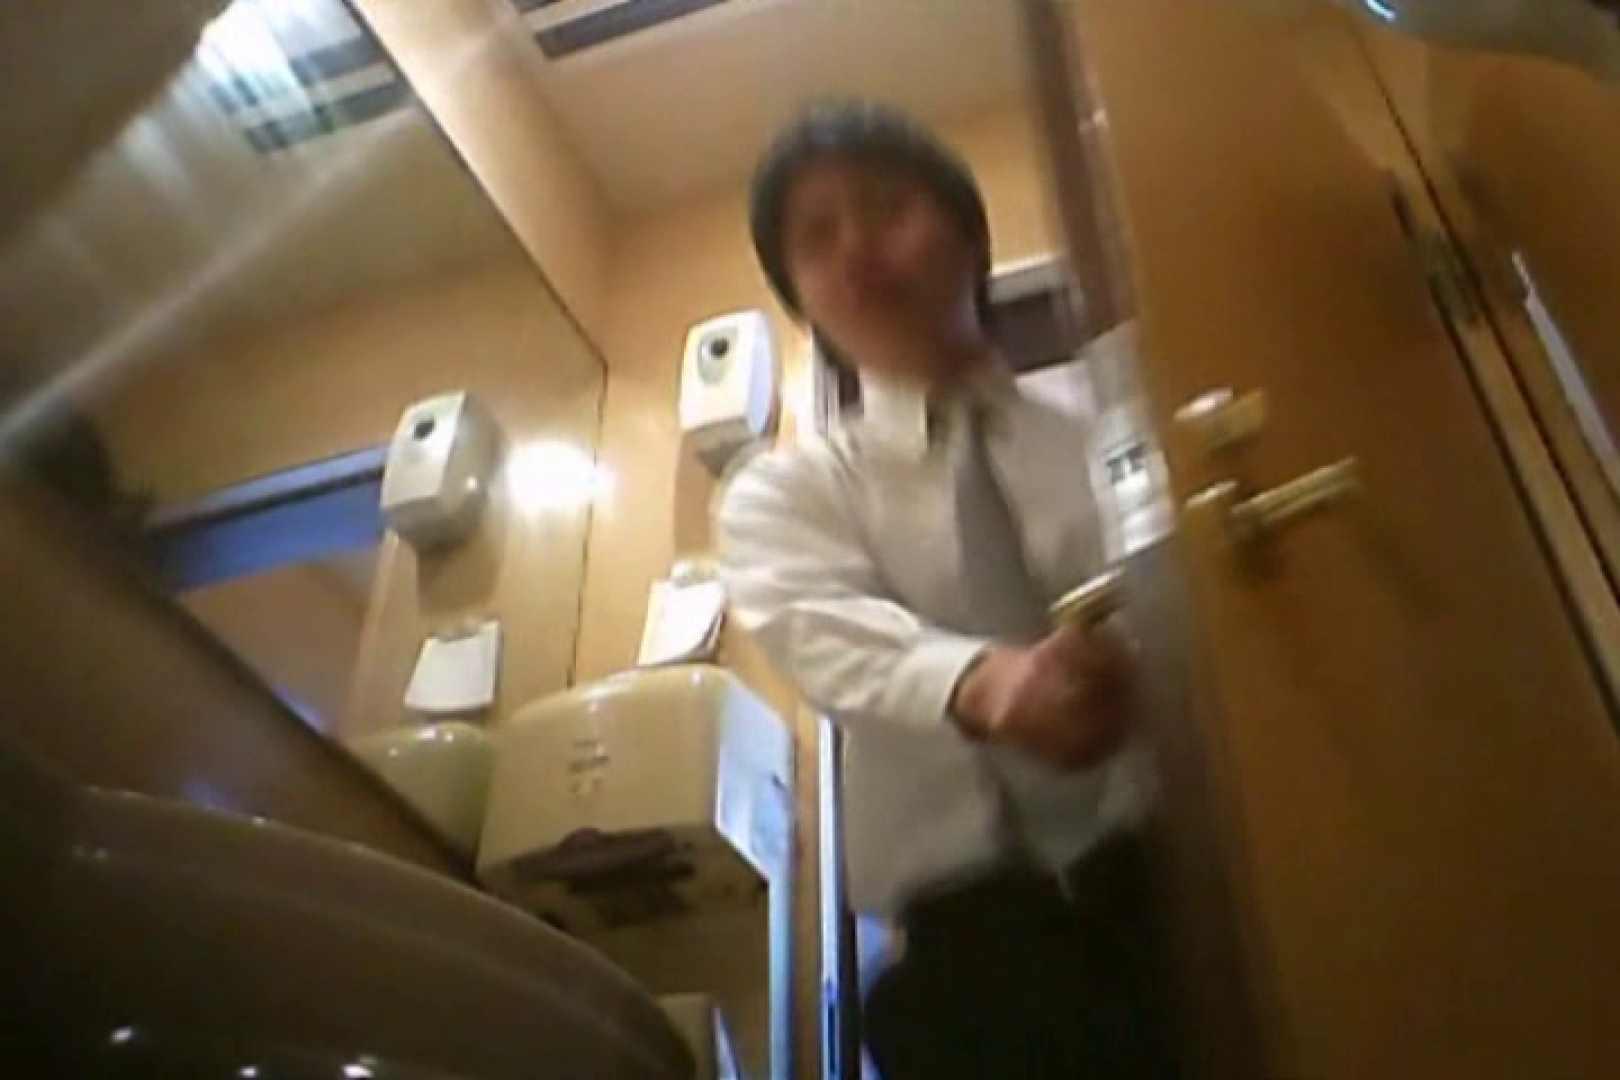 SEASON 3rd!掴み取りさんの洗面所覗き!in新幹線!VOL.20 スーツ ゲイ無料エロ画像 96連発 71